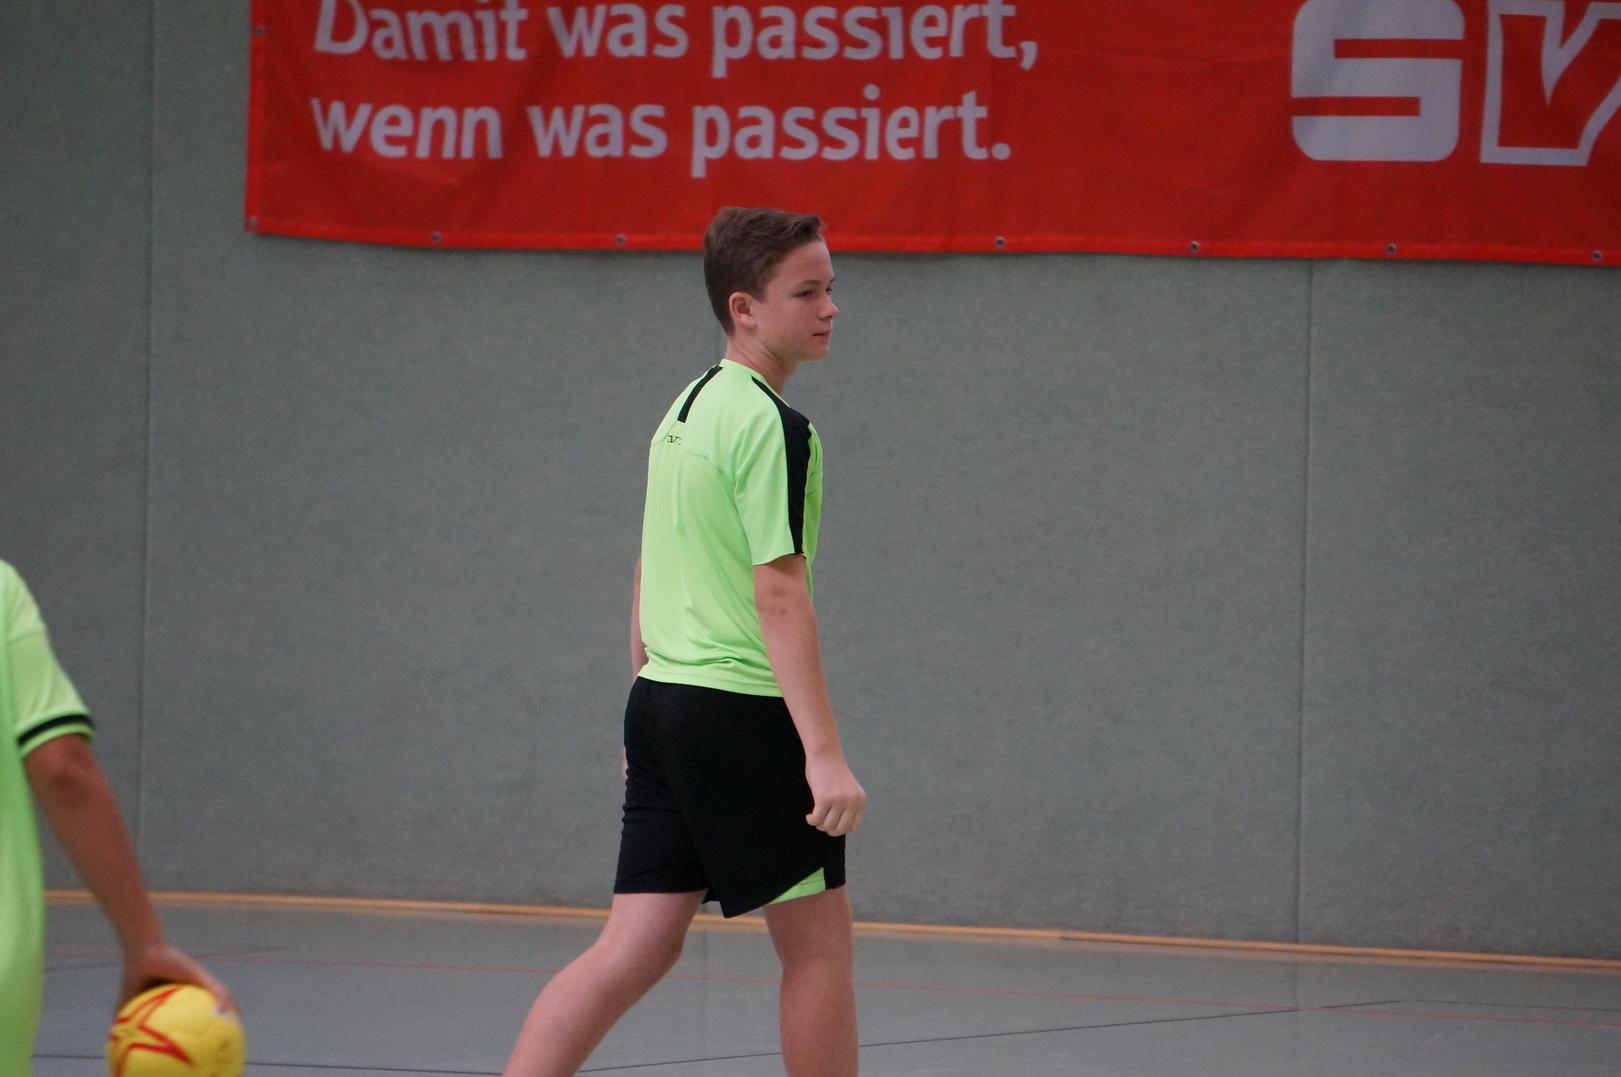 201808_Handballcamp_SDH_MG_073w